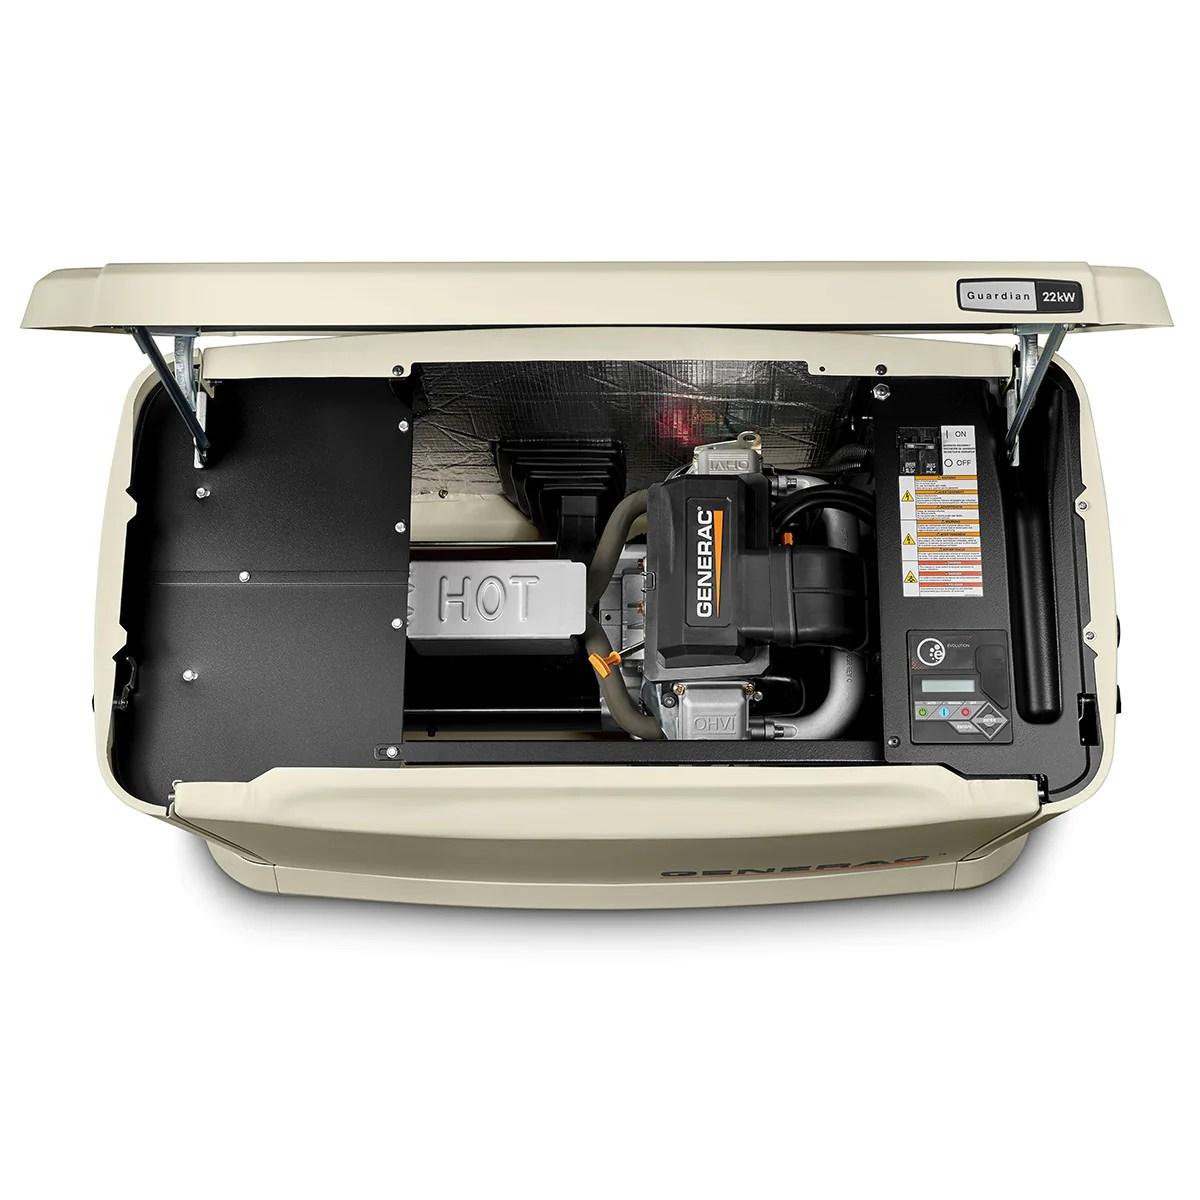 hight resolution of generac guardian 7042 22kw aluminum automatic standby generator